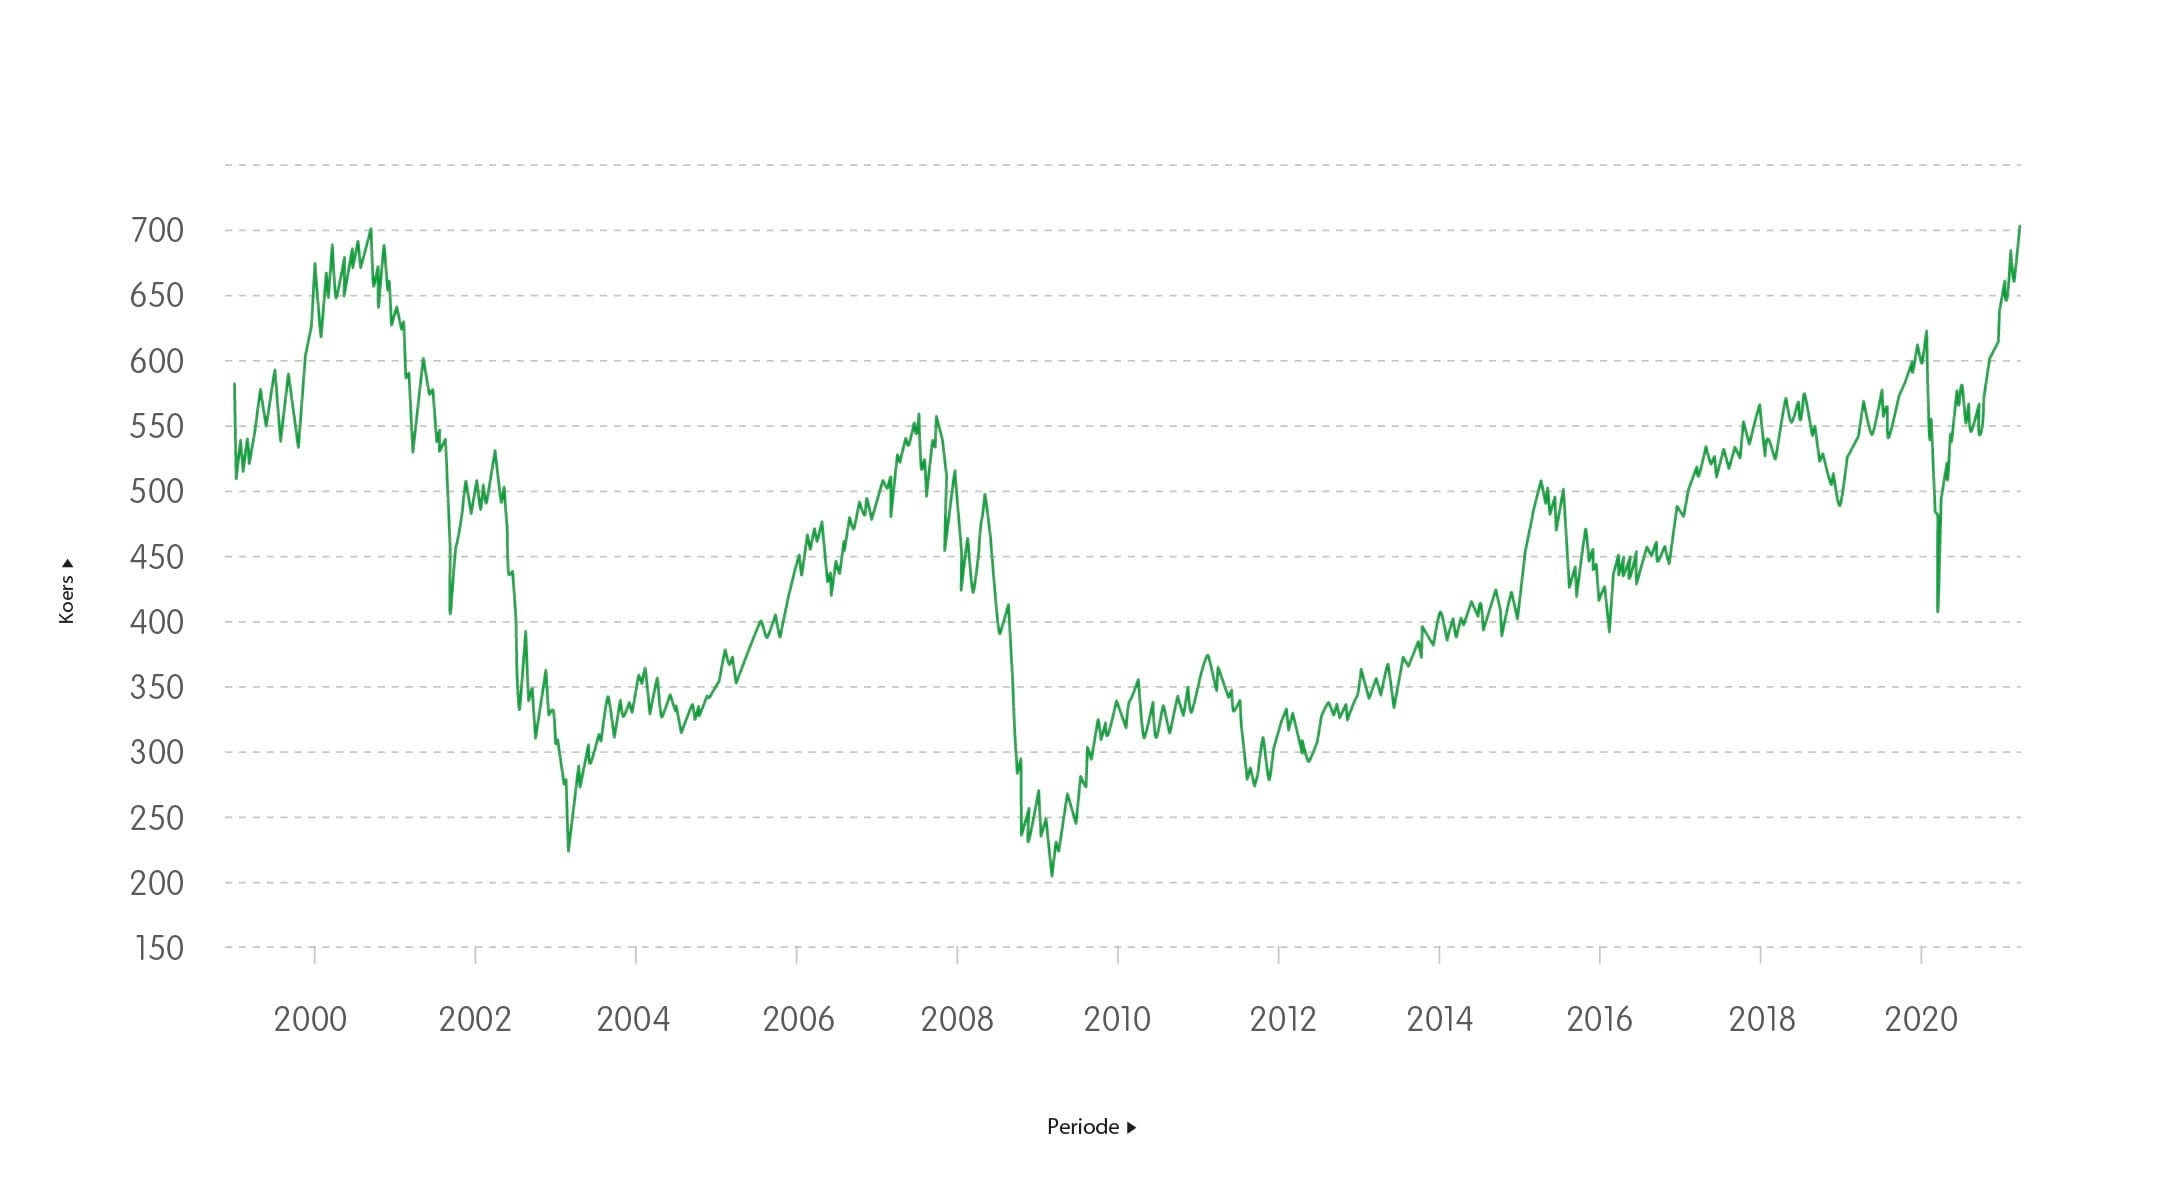 Koersontwikkeling AEX 1999 - 2021<br>